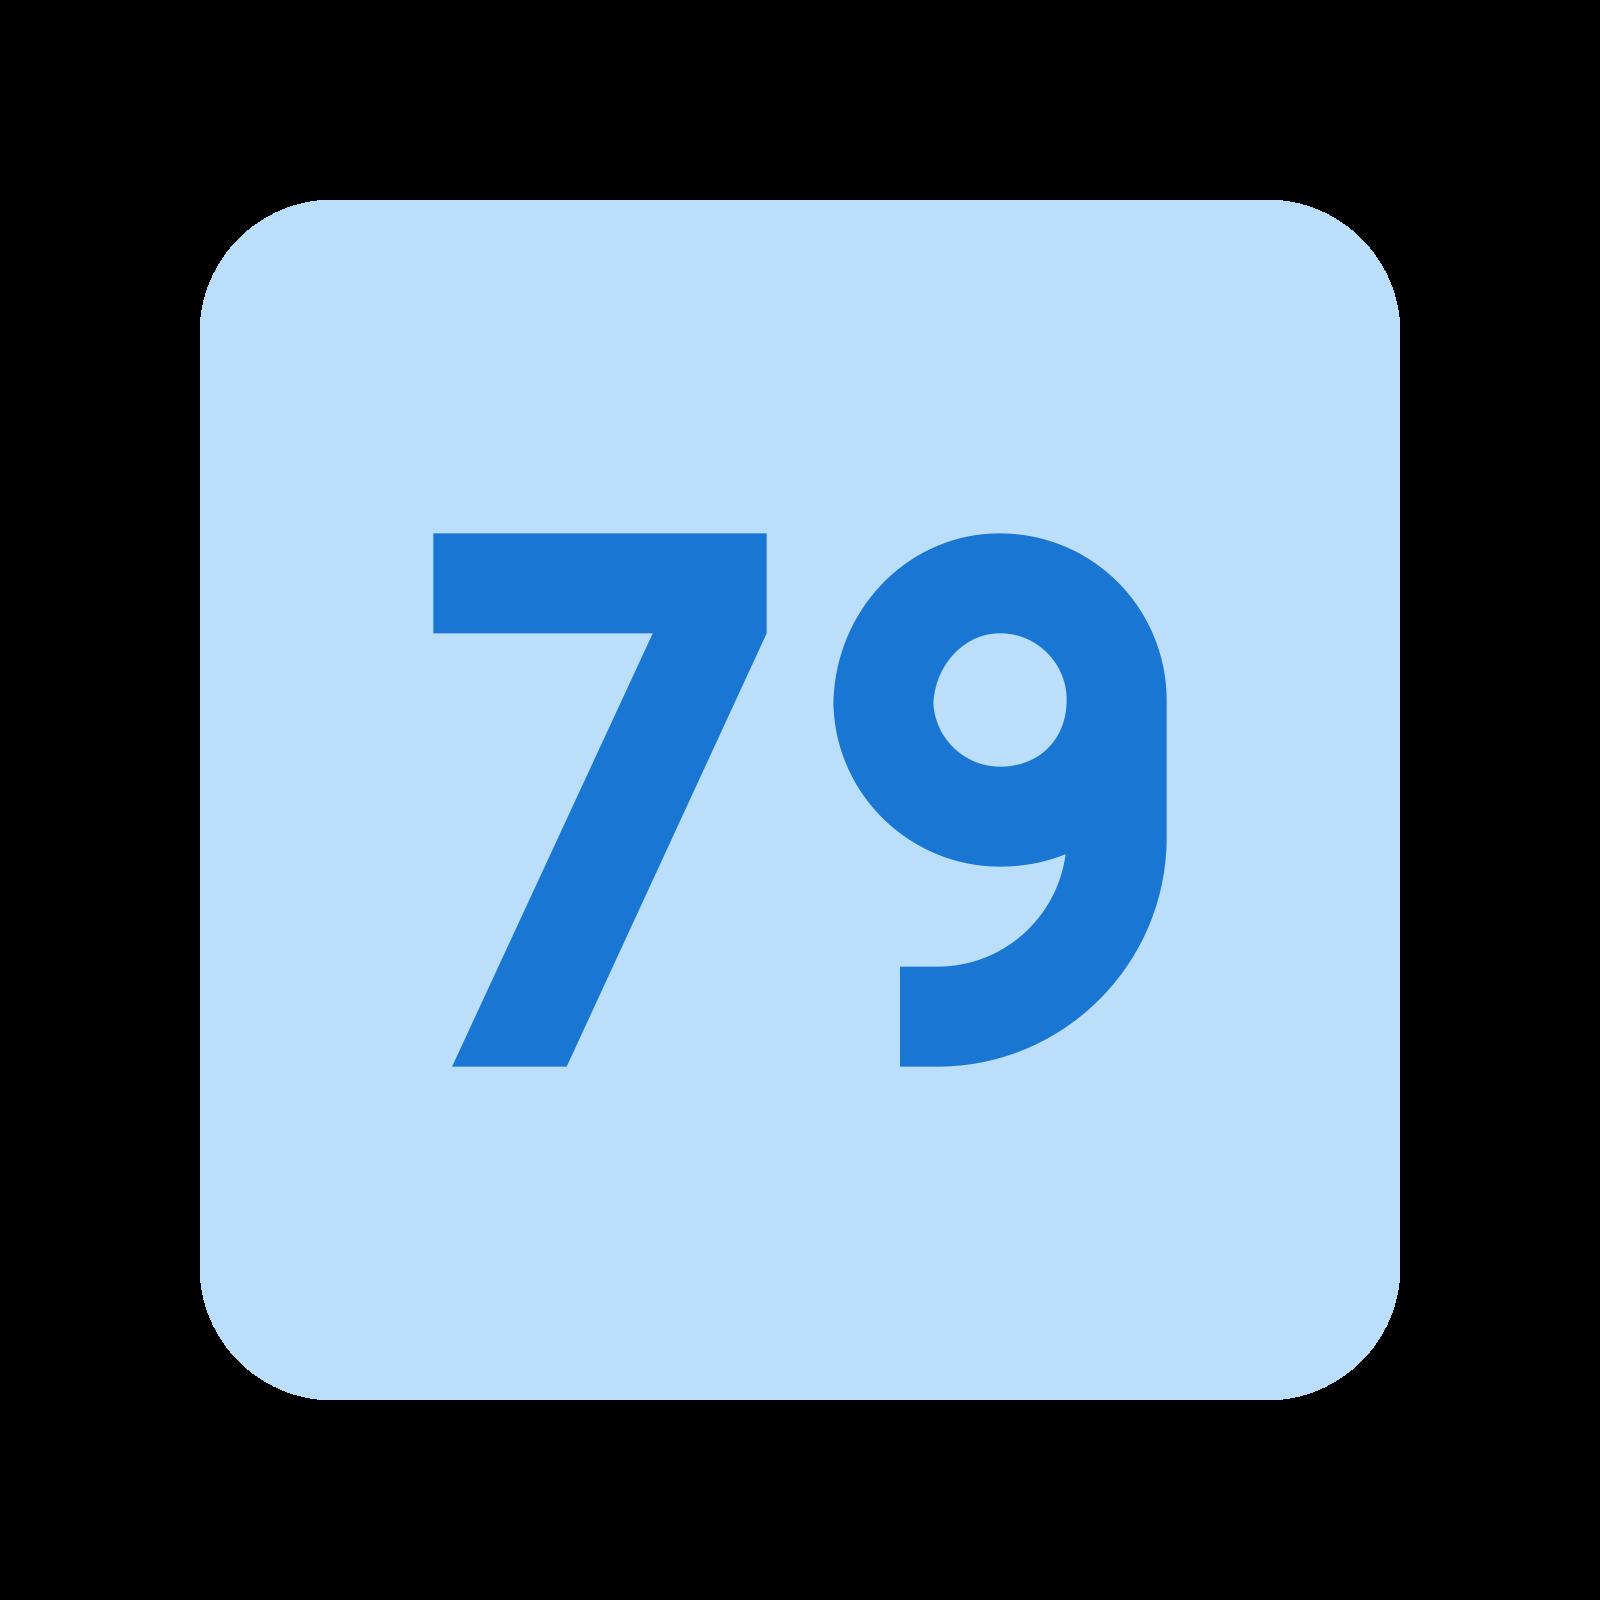 79 icon